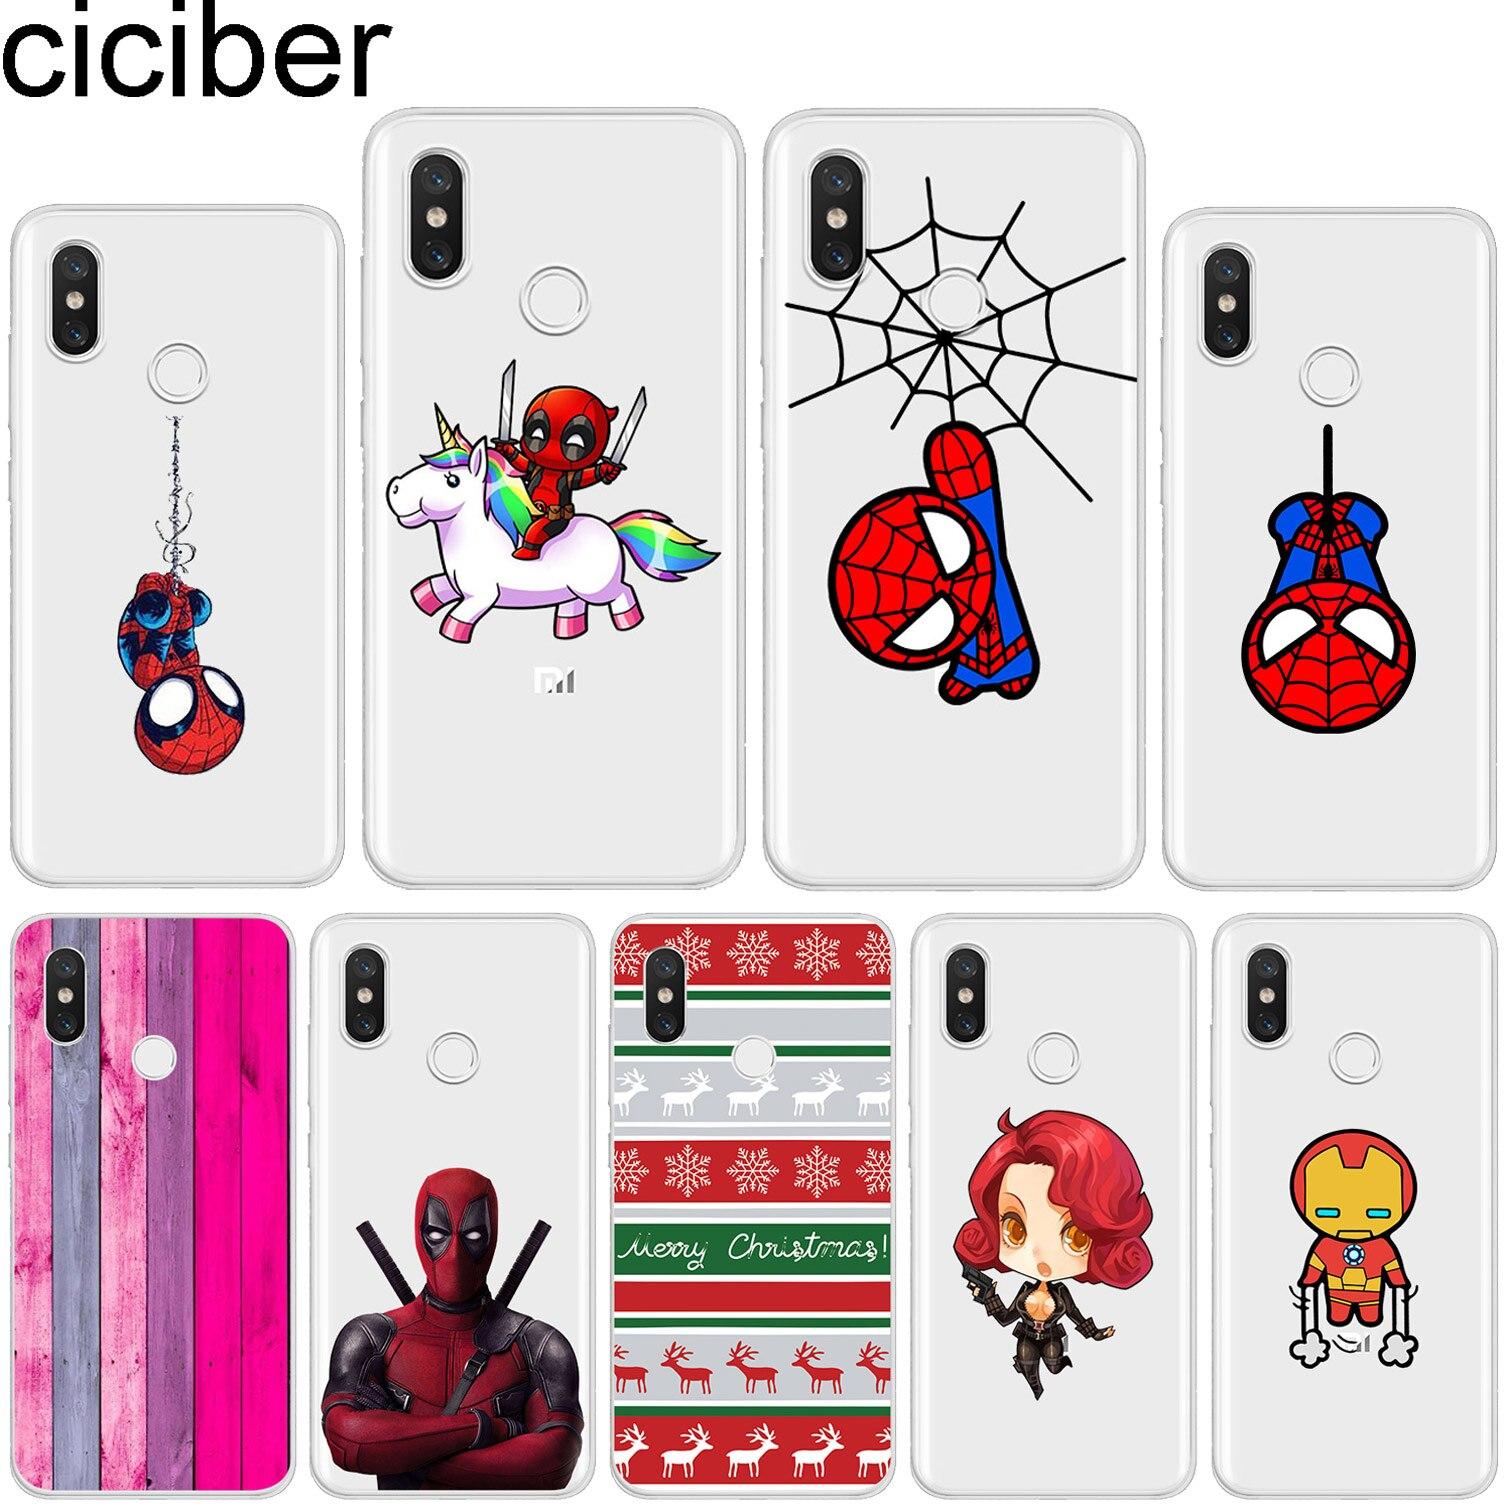 ciciber for Xiaomi MIX MAX 3 2 1 S Pro Marvel Spider-Man Soft TPU For Xiaomi A2 A1 8 6 5 X 5C 5S Plus Lite SE PocoPhone F1 Cases